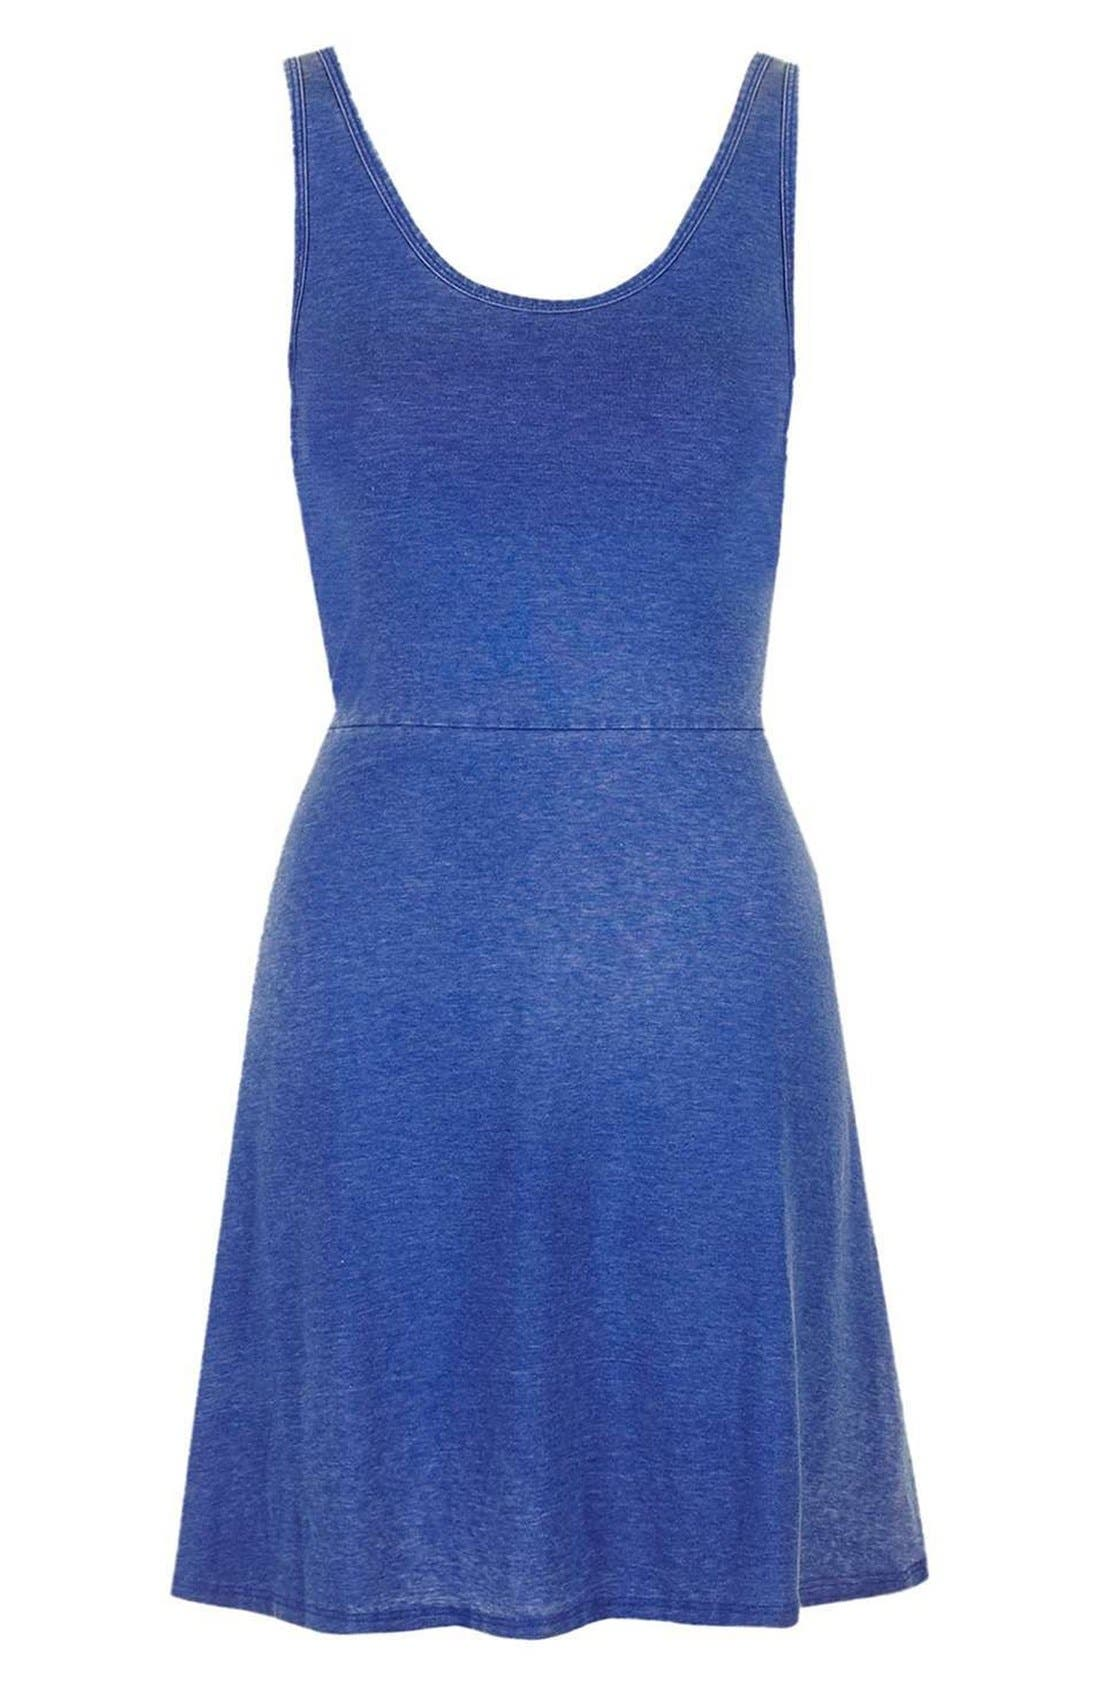 Main Image - Topshop Burnout Jersey Skater Dress